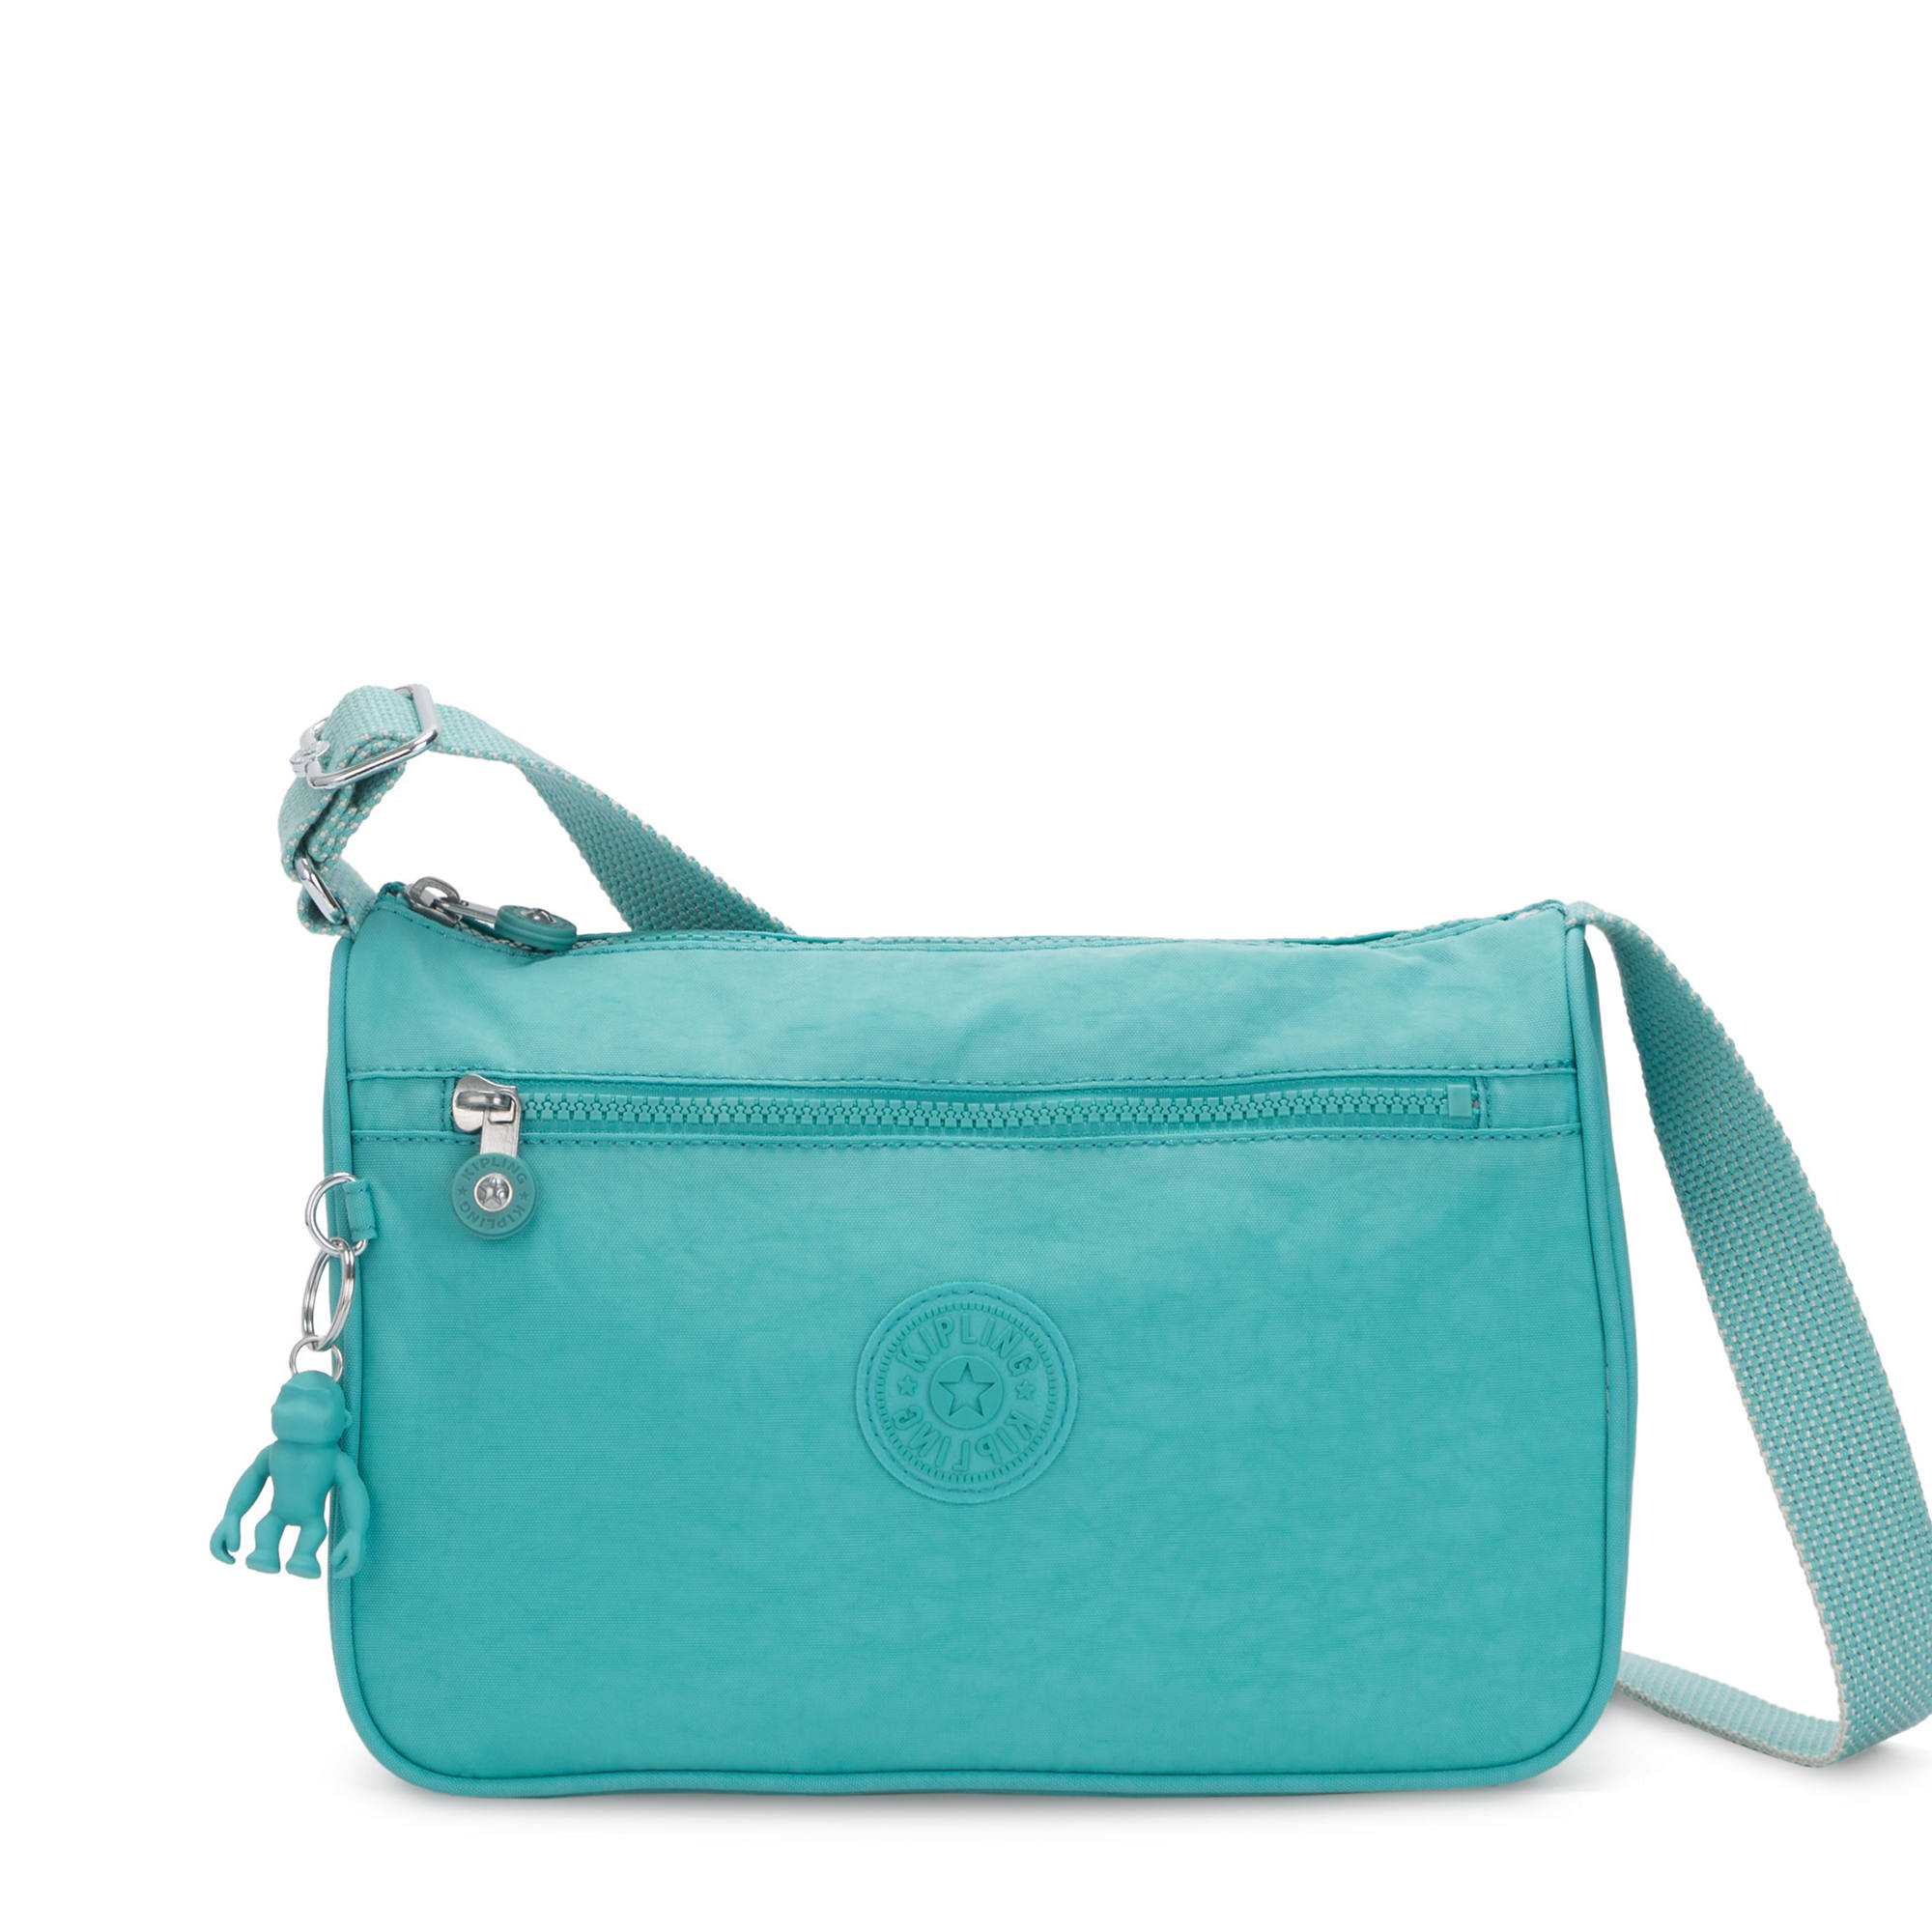 Callie Handbag,Seaglass Blue,large-zoomed